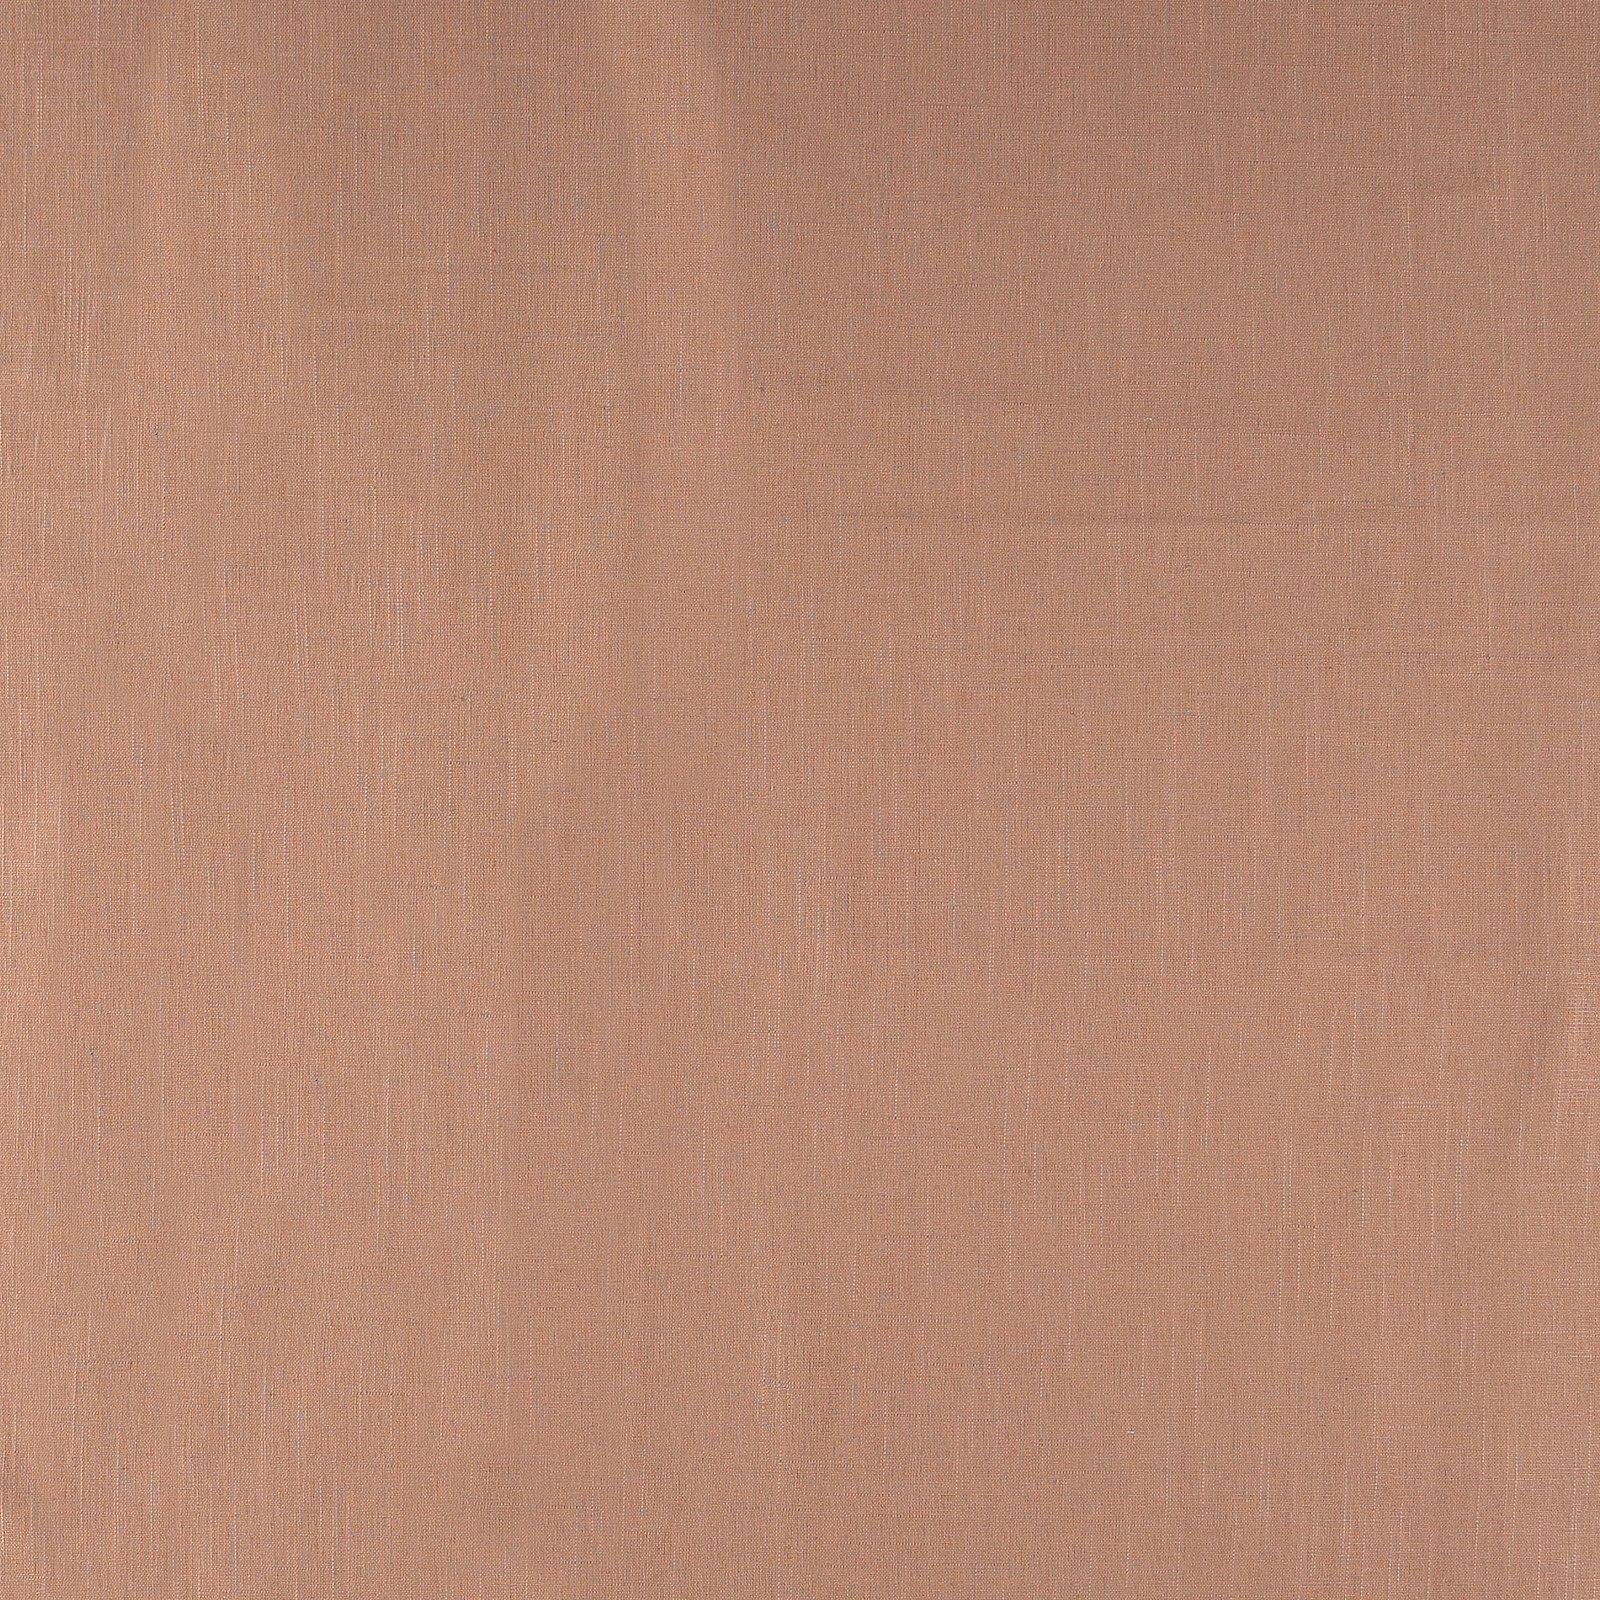 Coarse linen/viscose dark powder 852340_pack_solid